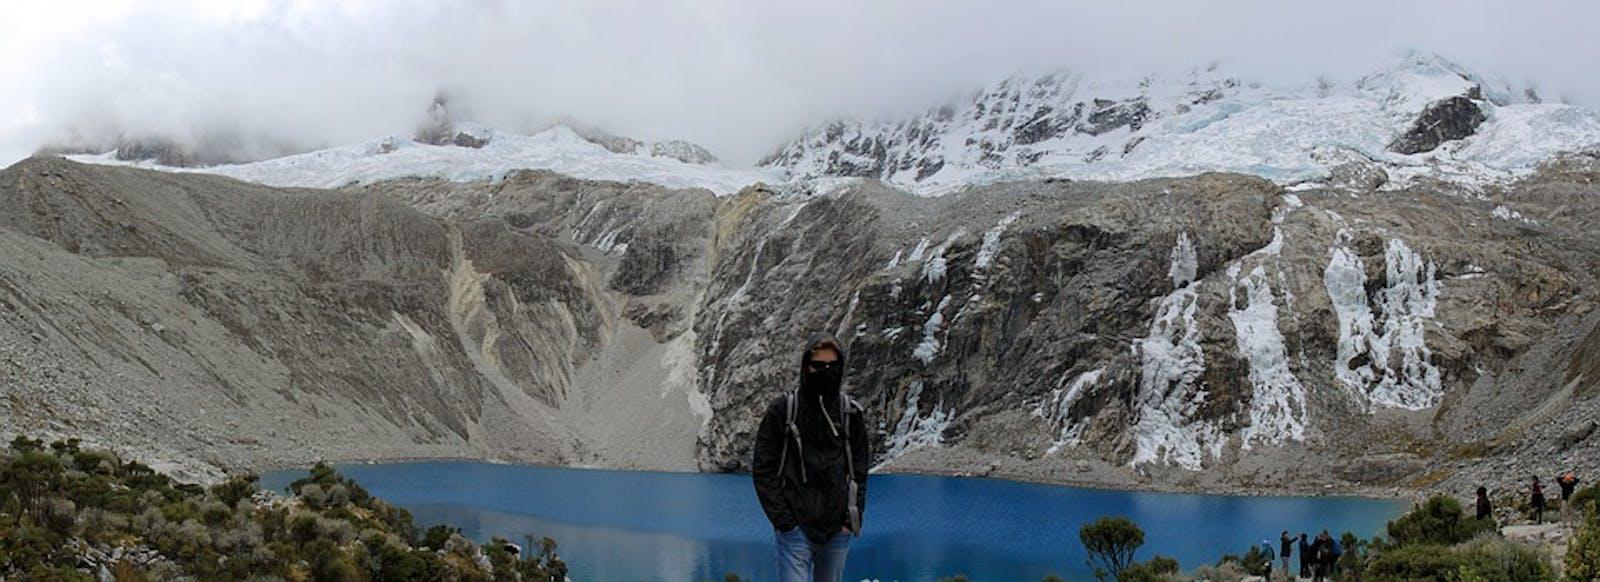 Cordillera Central Páramo